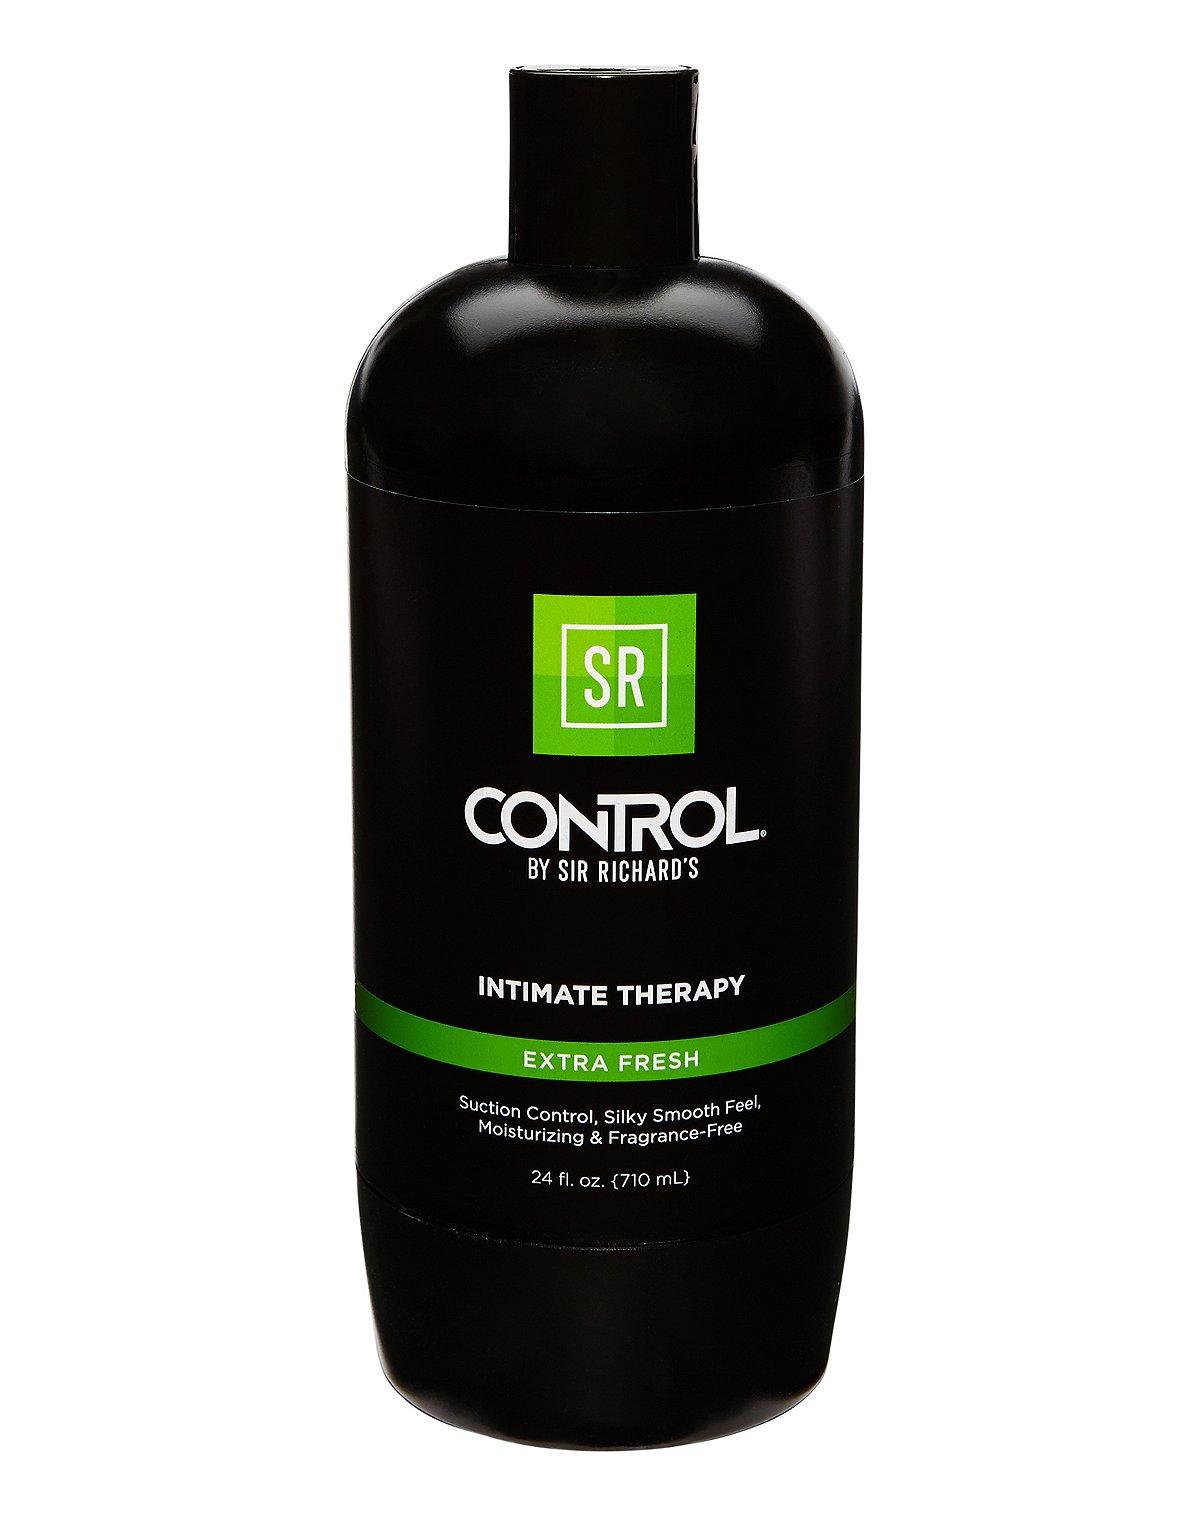 shampoo bottle discreet stroker men's sex toy male masturbator